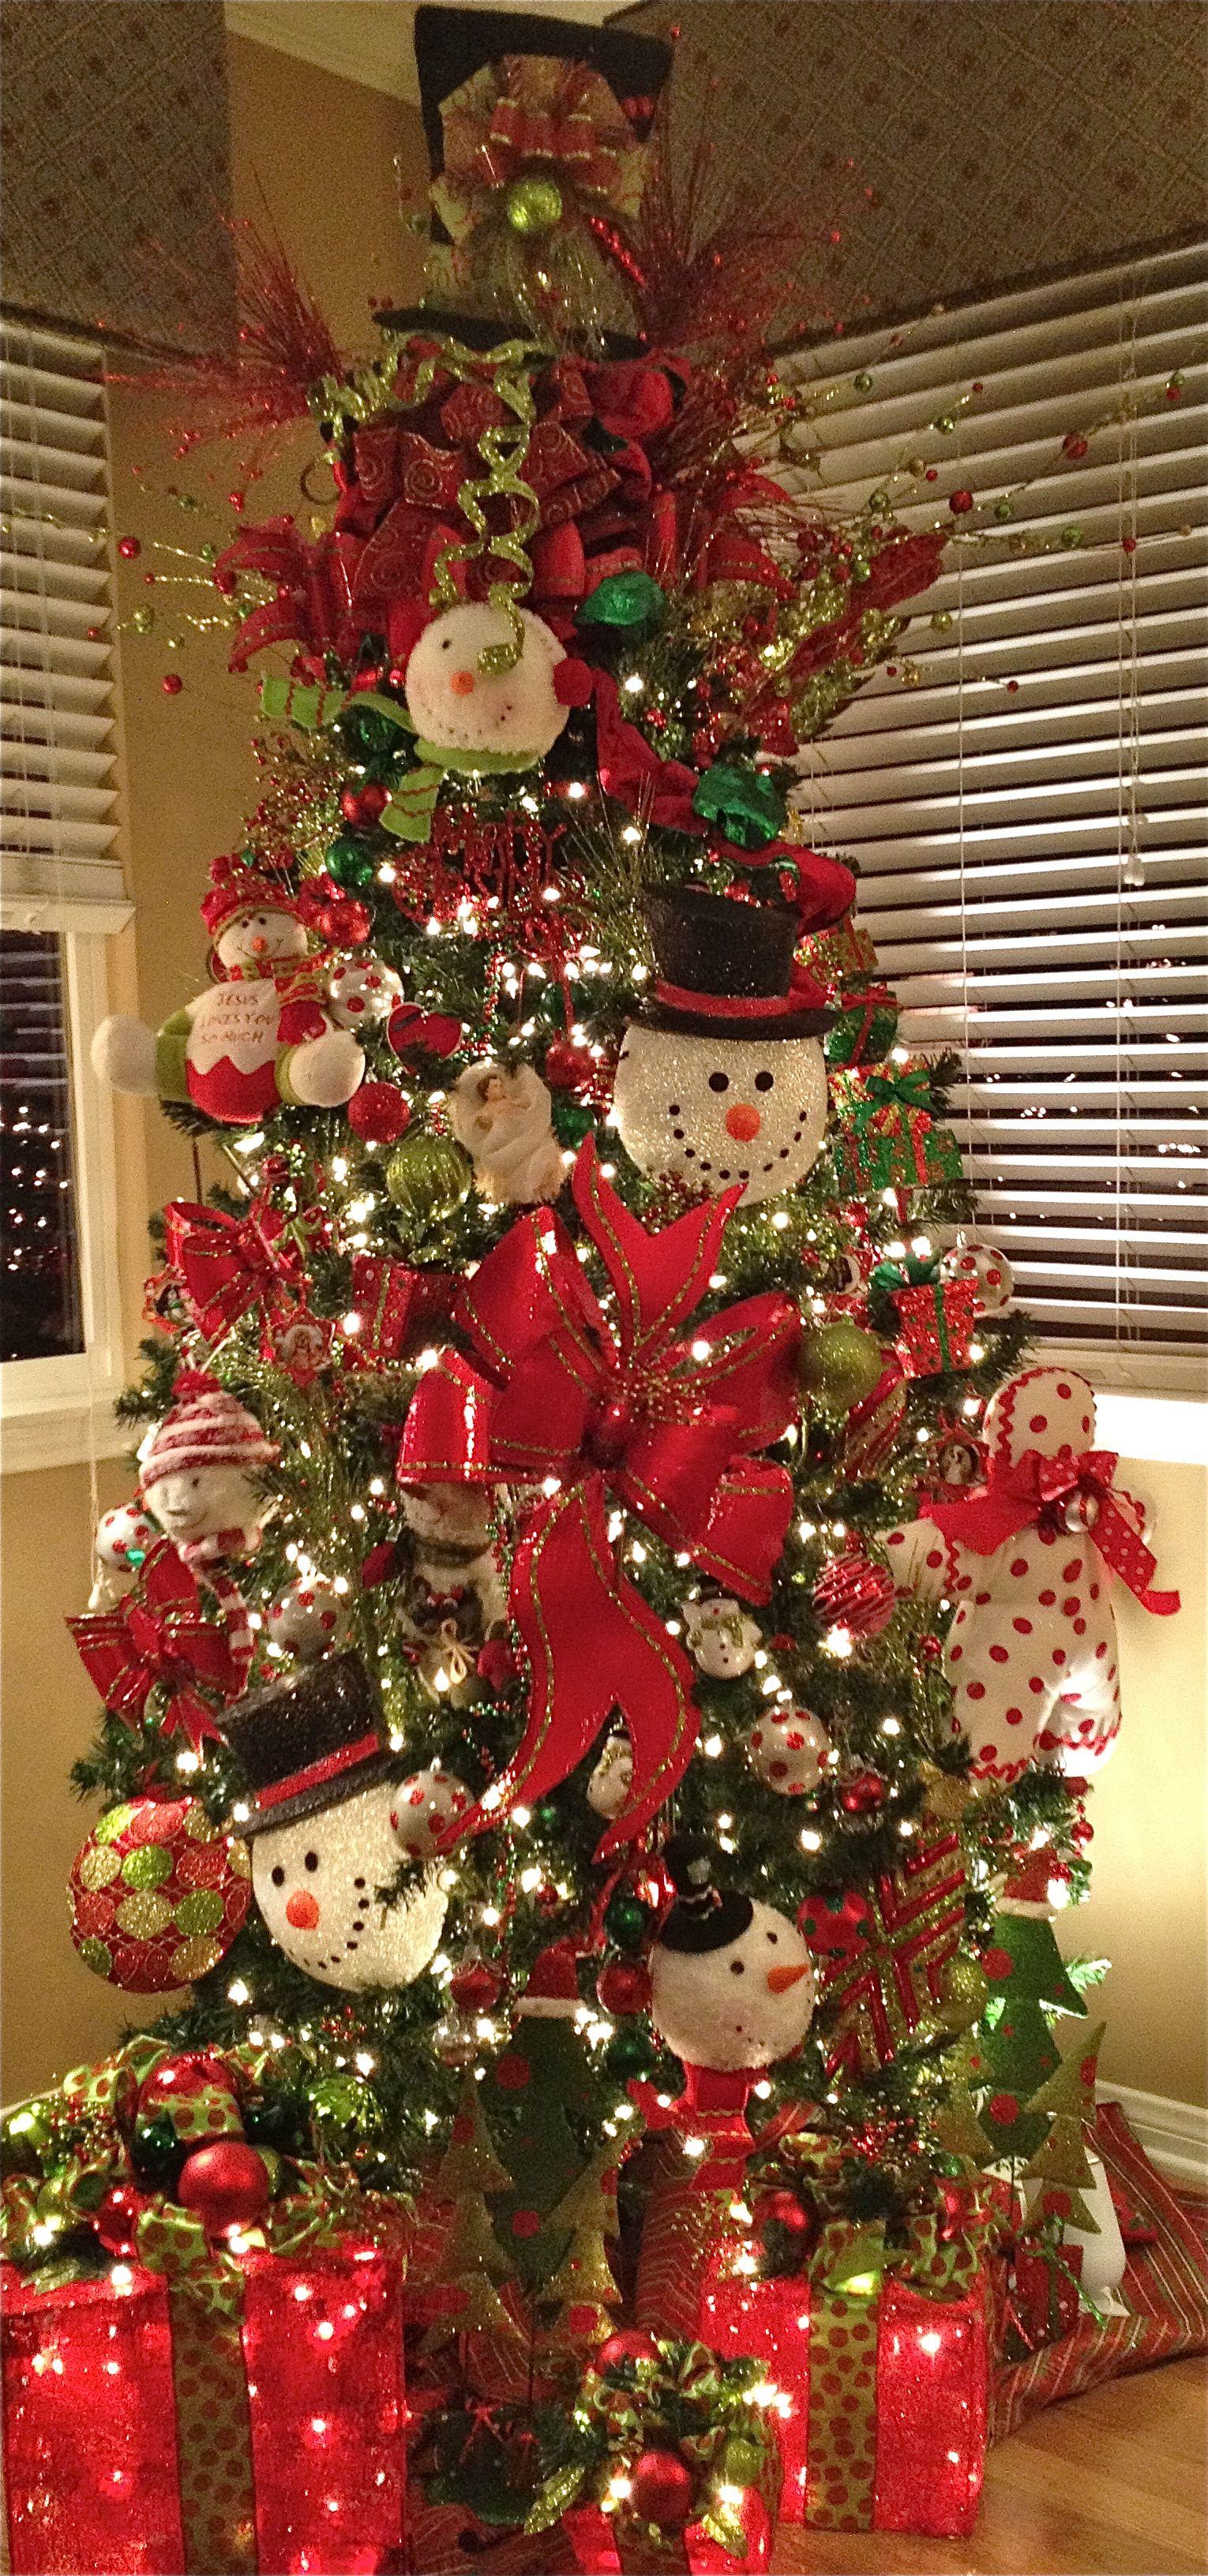 50 Festive Christmas Tree Decorating Ideas Christmas